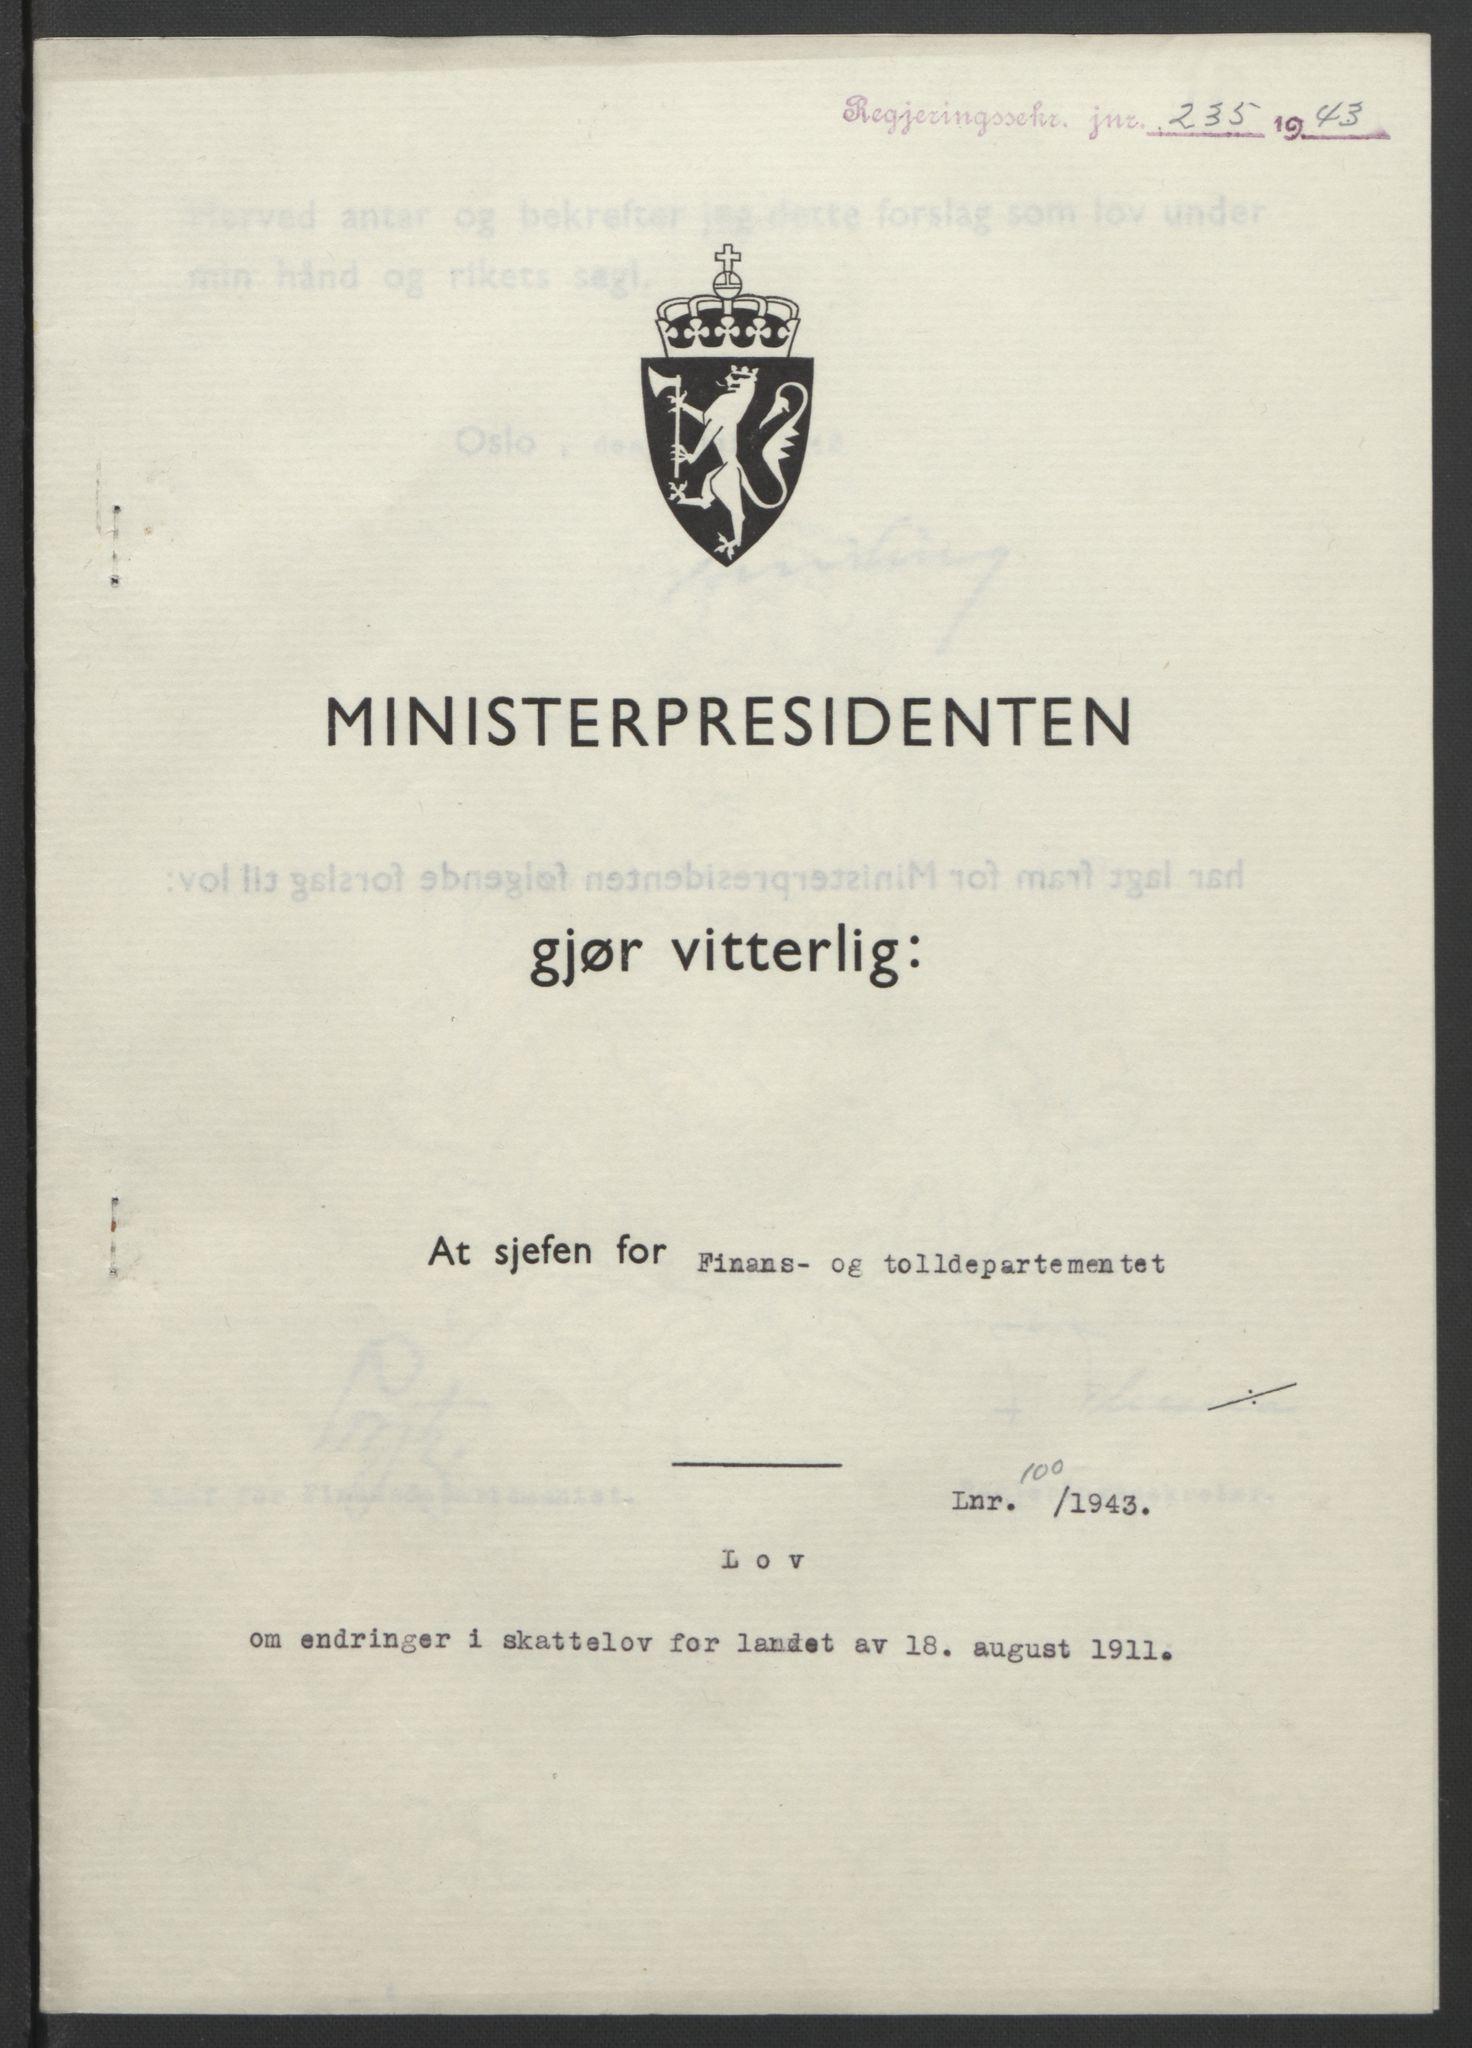 RA, NS-administrasjonen 1940-1945 (Statsrådsekretariatet, de kommisariske statsråder mm), D/Db/L0099: Lover, 1943, s. 456